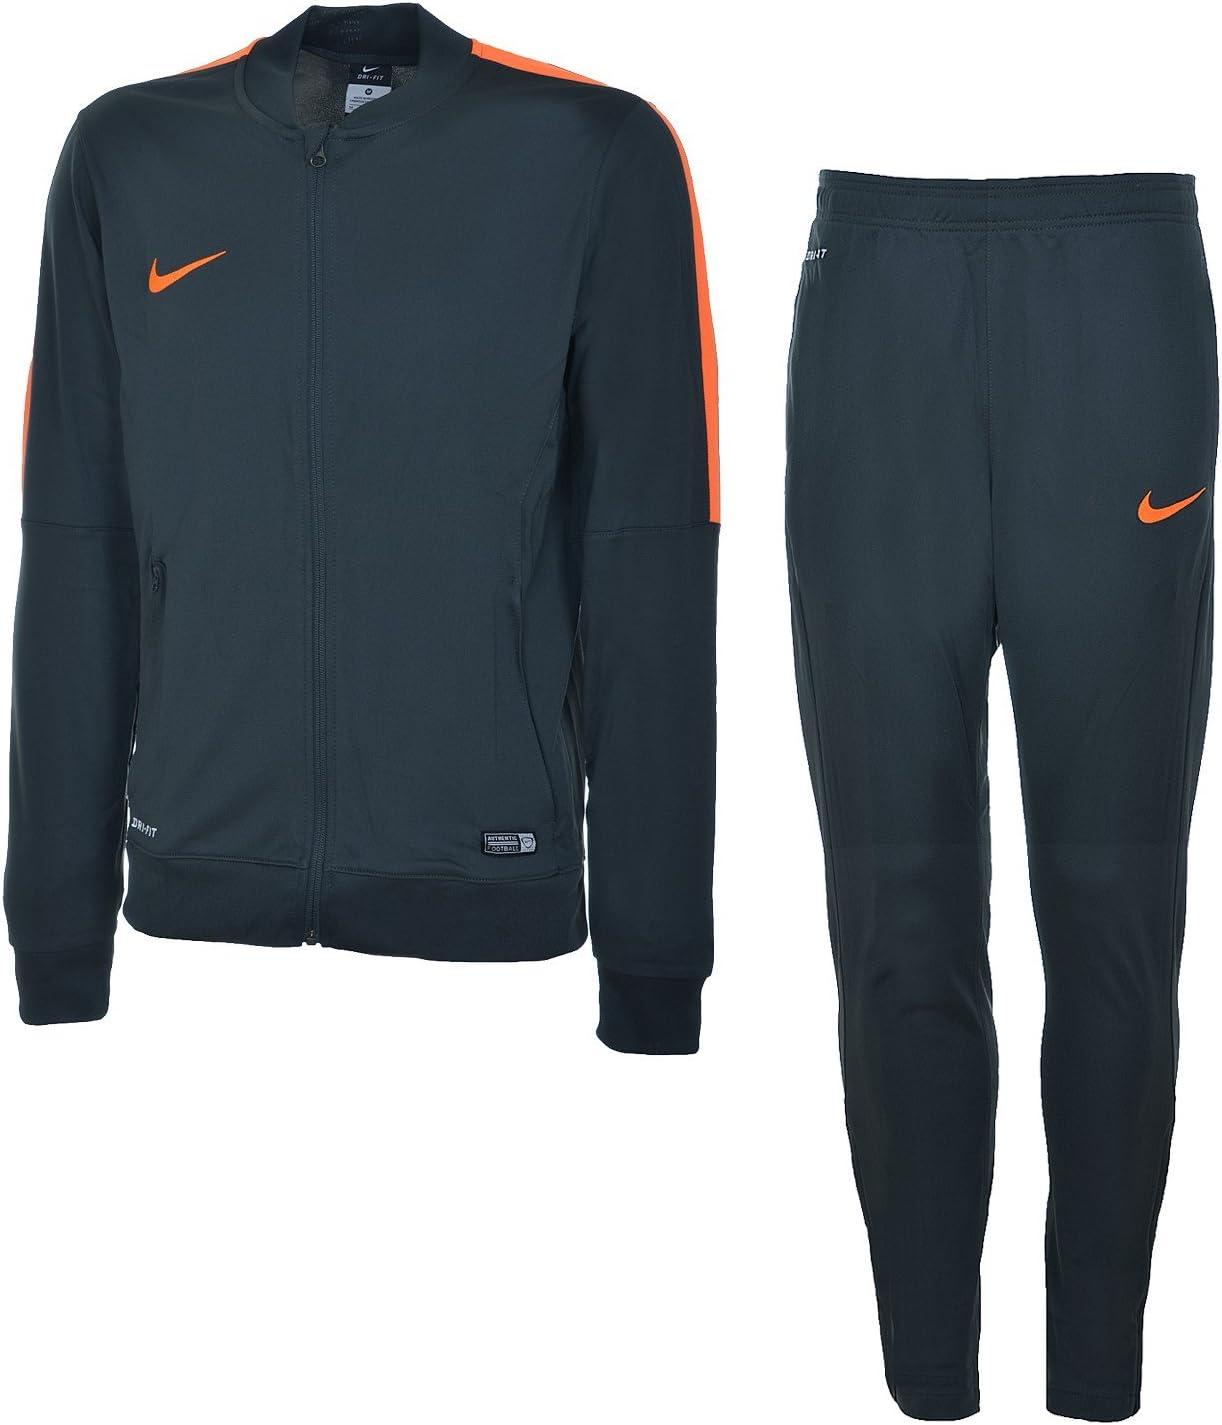 Nike Sportswear – Chándal para Hombre, Color Gris/Naranja, tamaño ...